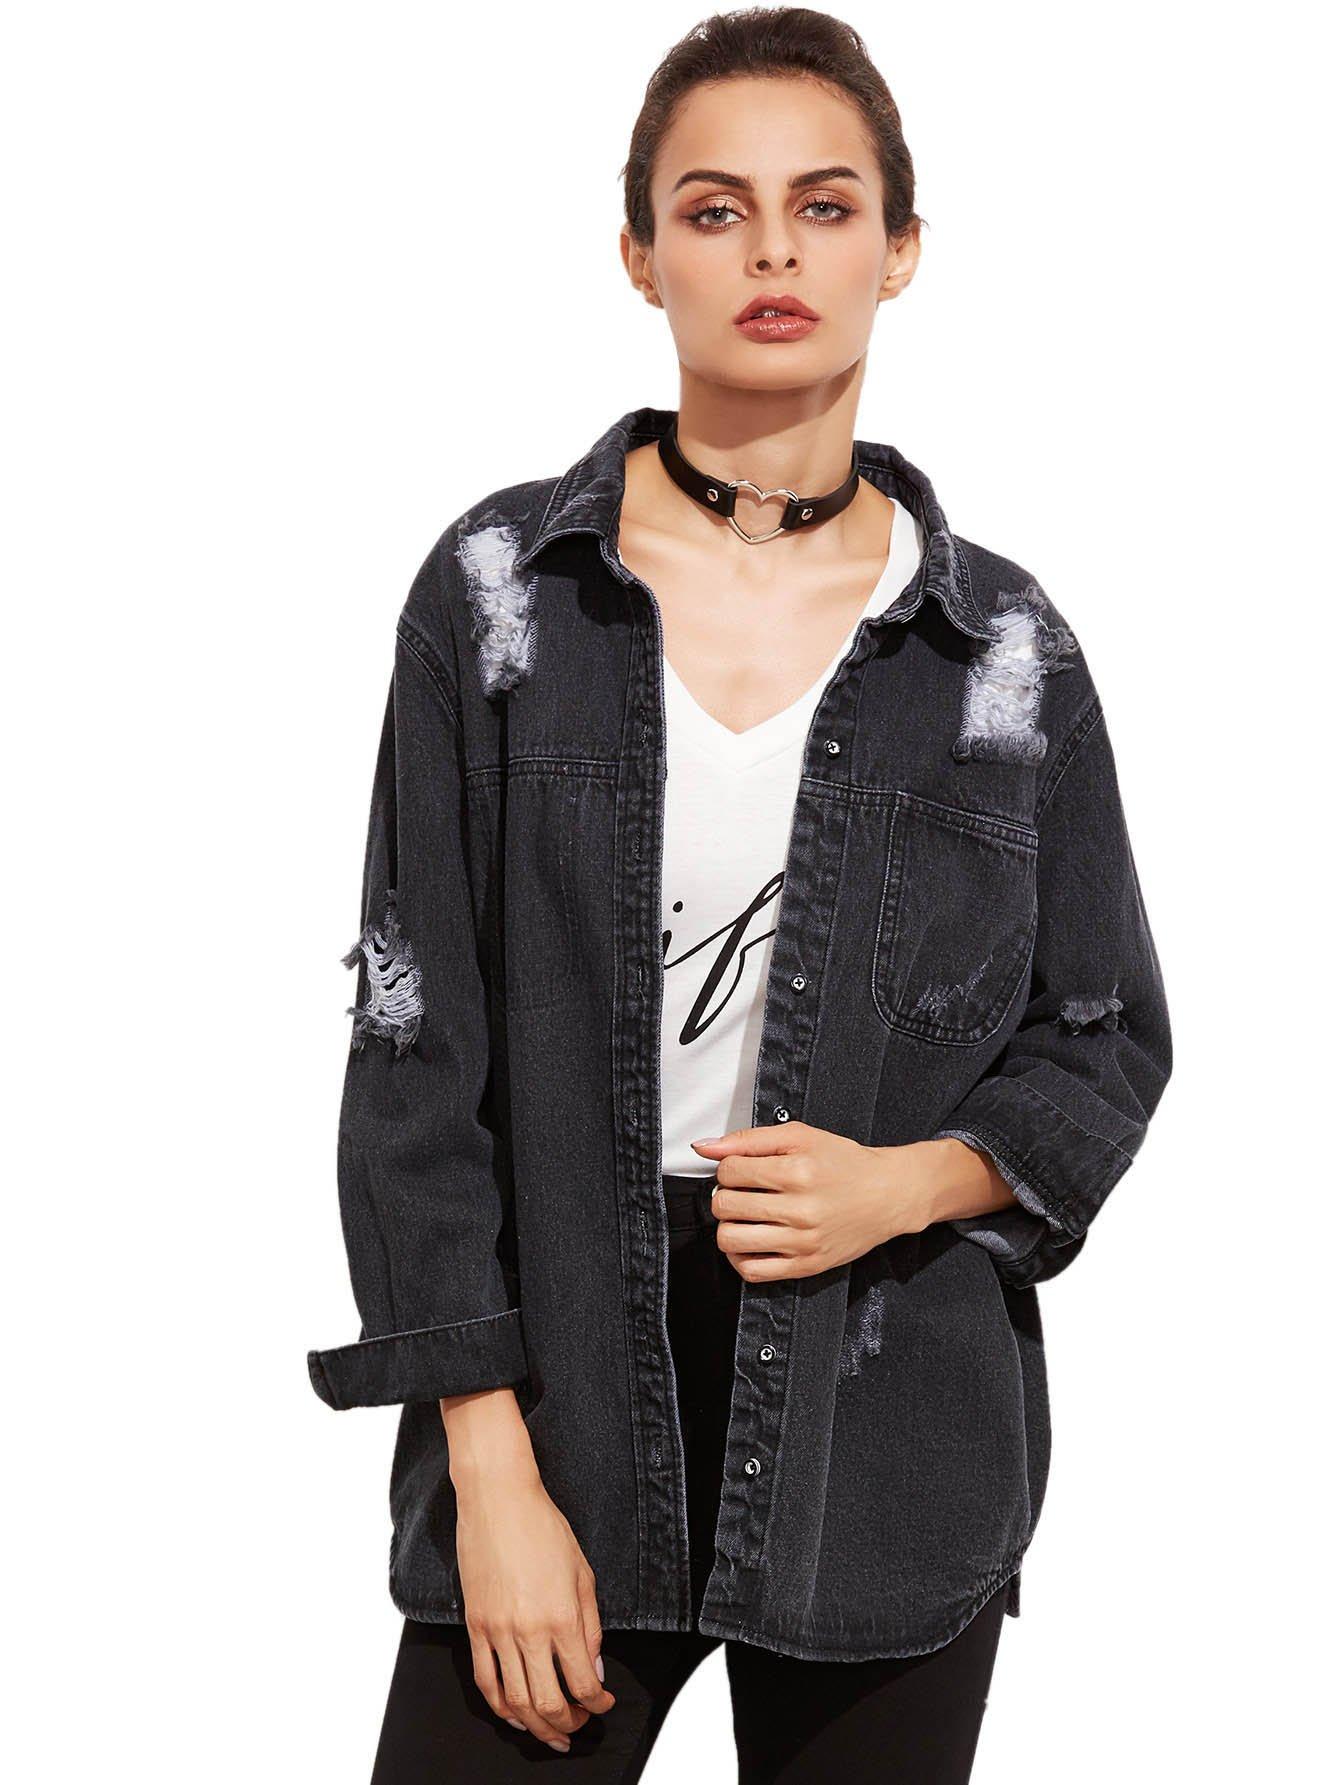 SheIn Women's Boyfriend Distressed Button up Long Sleeve Denim Jacket Black Small